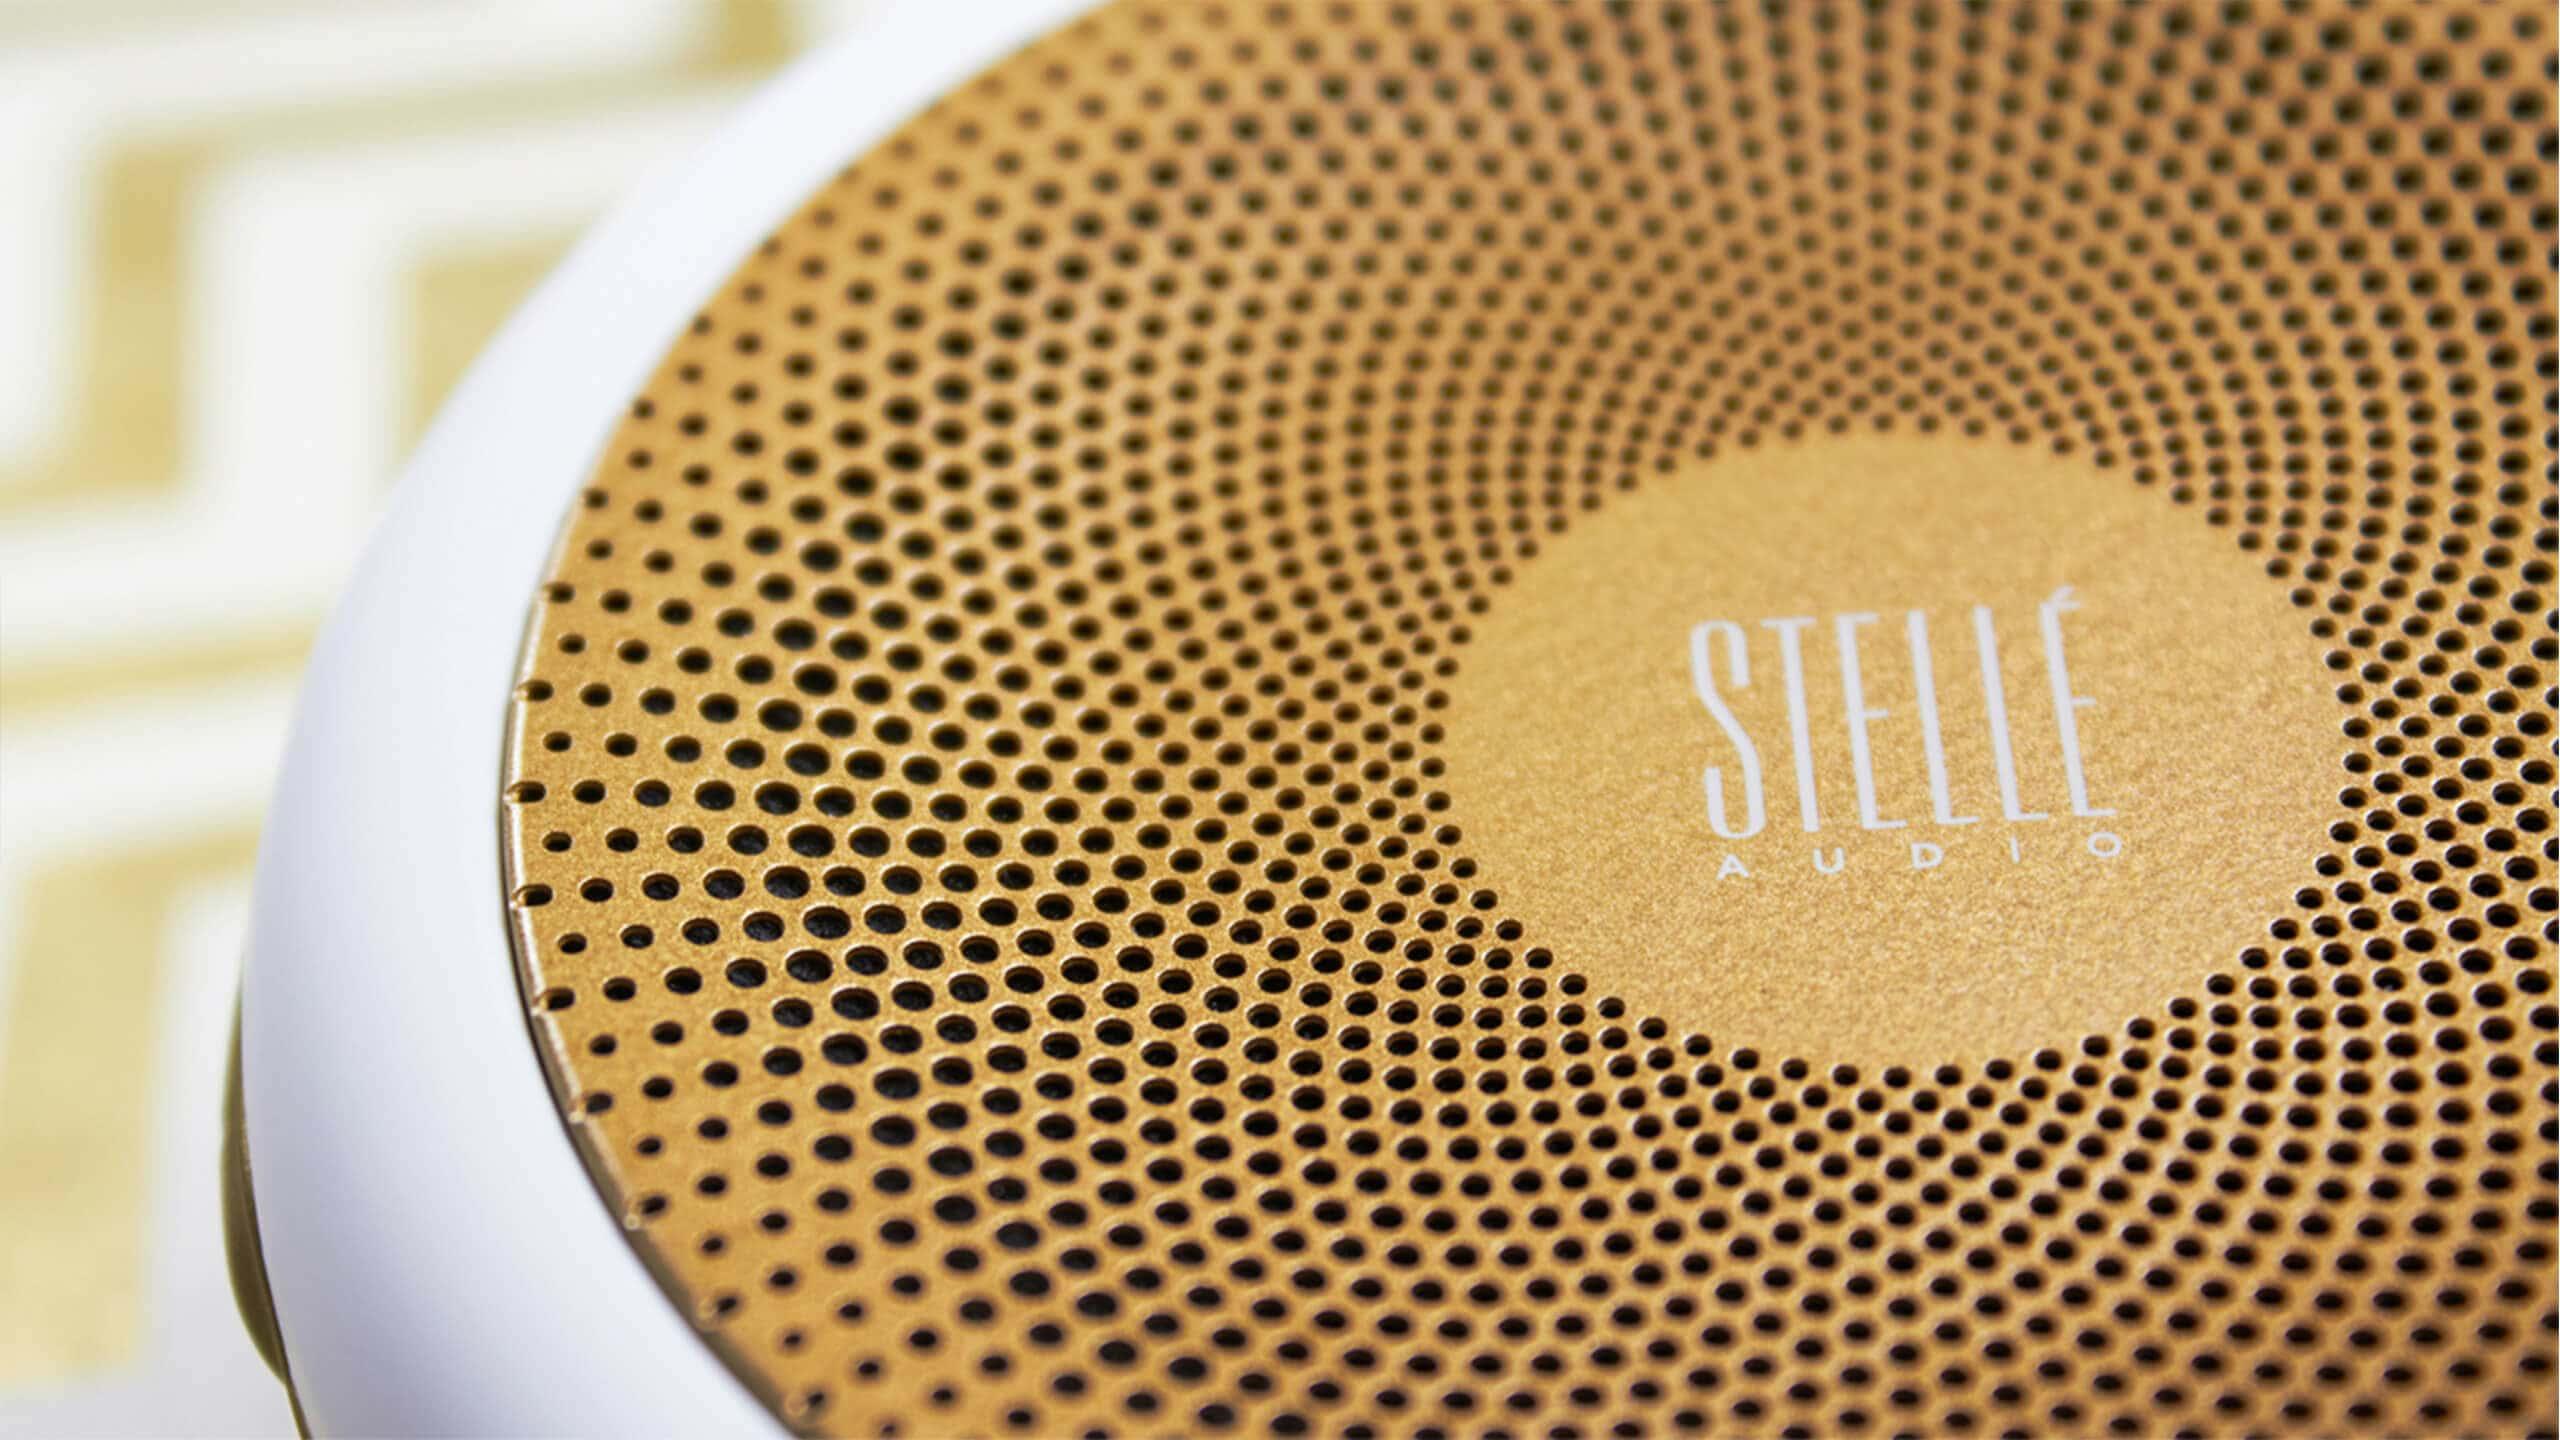 Sprout studios, Boston, industrial design, product design, start up, 3D print, rendering, CAD, Branding, graphic design, environmental design, brand, packaging design, stelle go-go, stelle audio, portable speaker, logo design